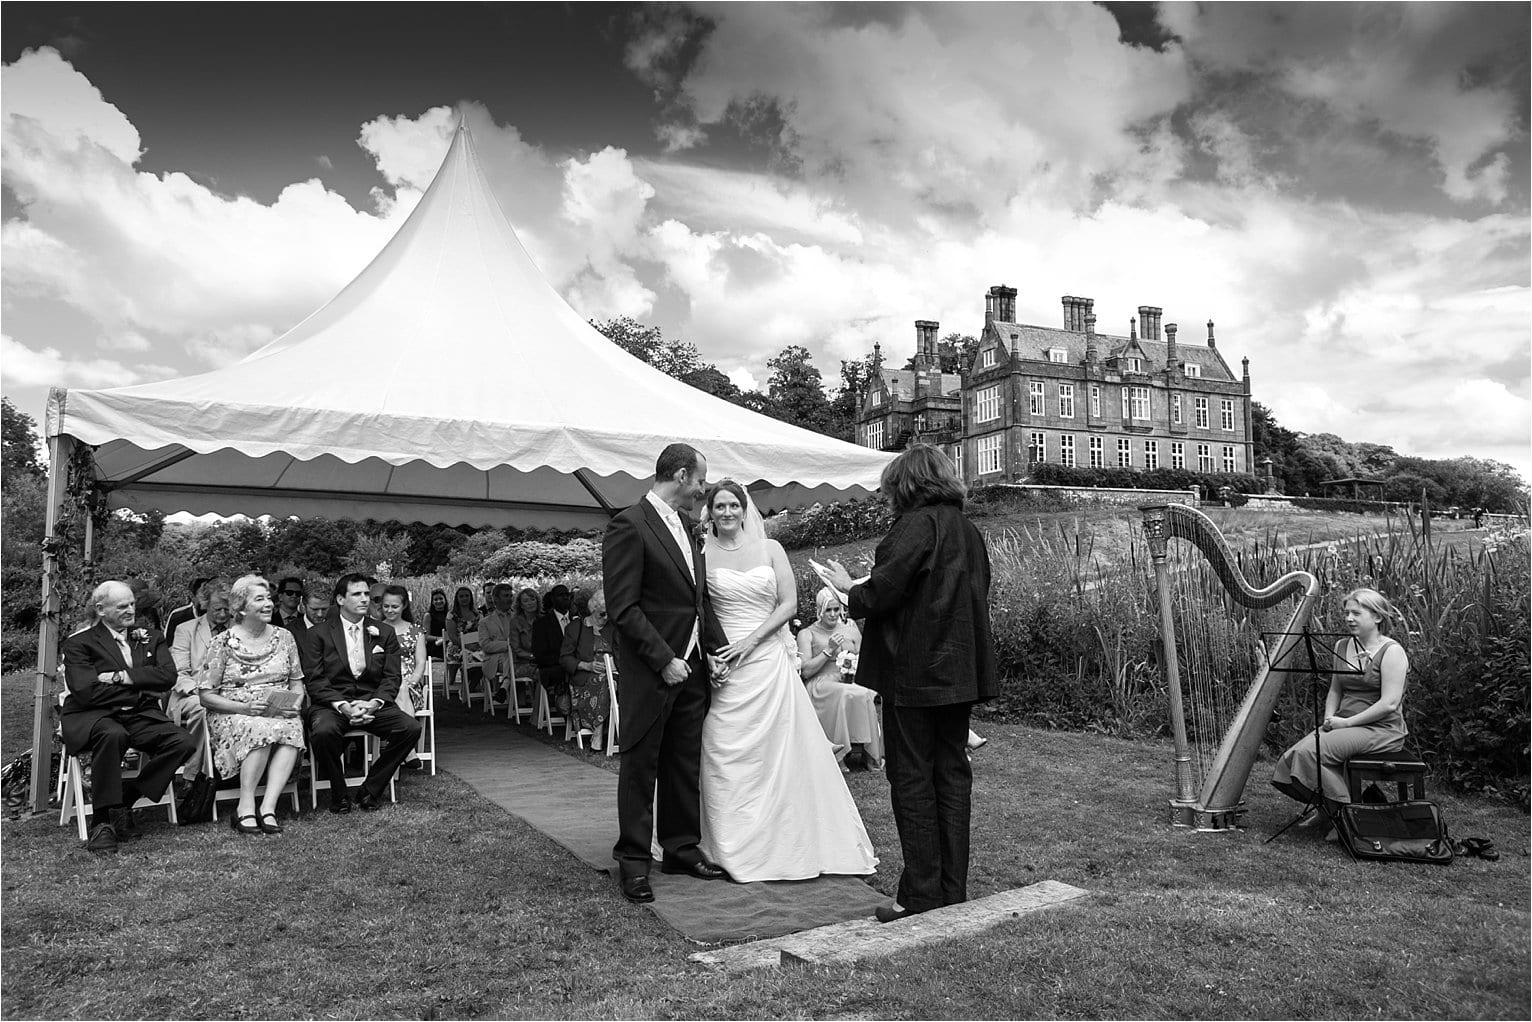 Summer wedding on Kitley House island